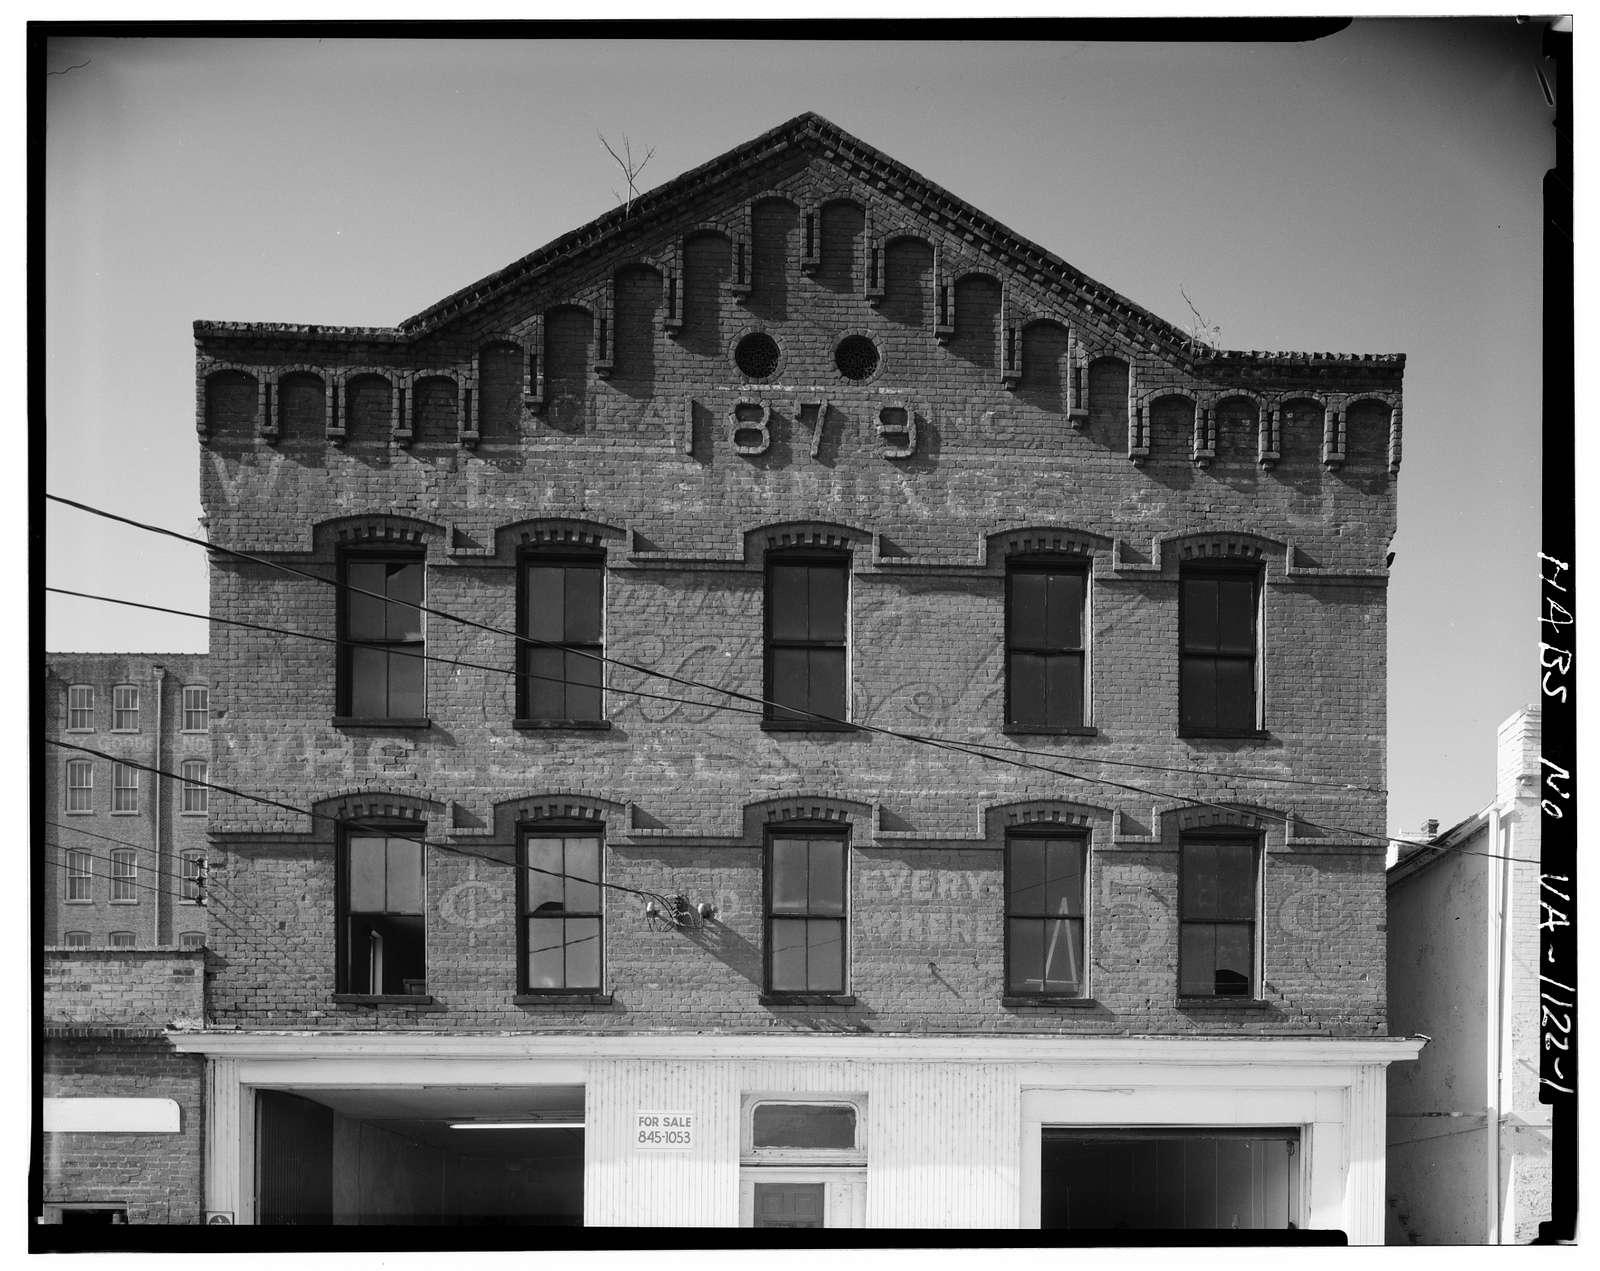 1879 Building, Jefferson Street between Eighth & Ninth Streets, Lynchburg, Lynchburg, VA